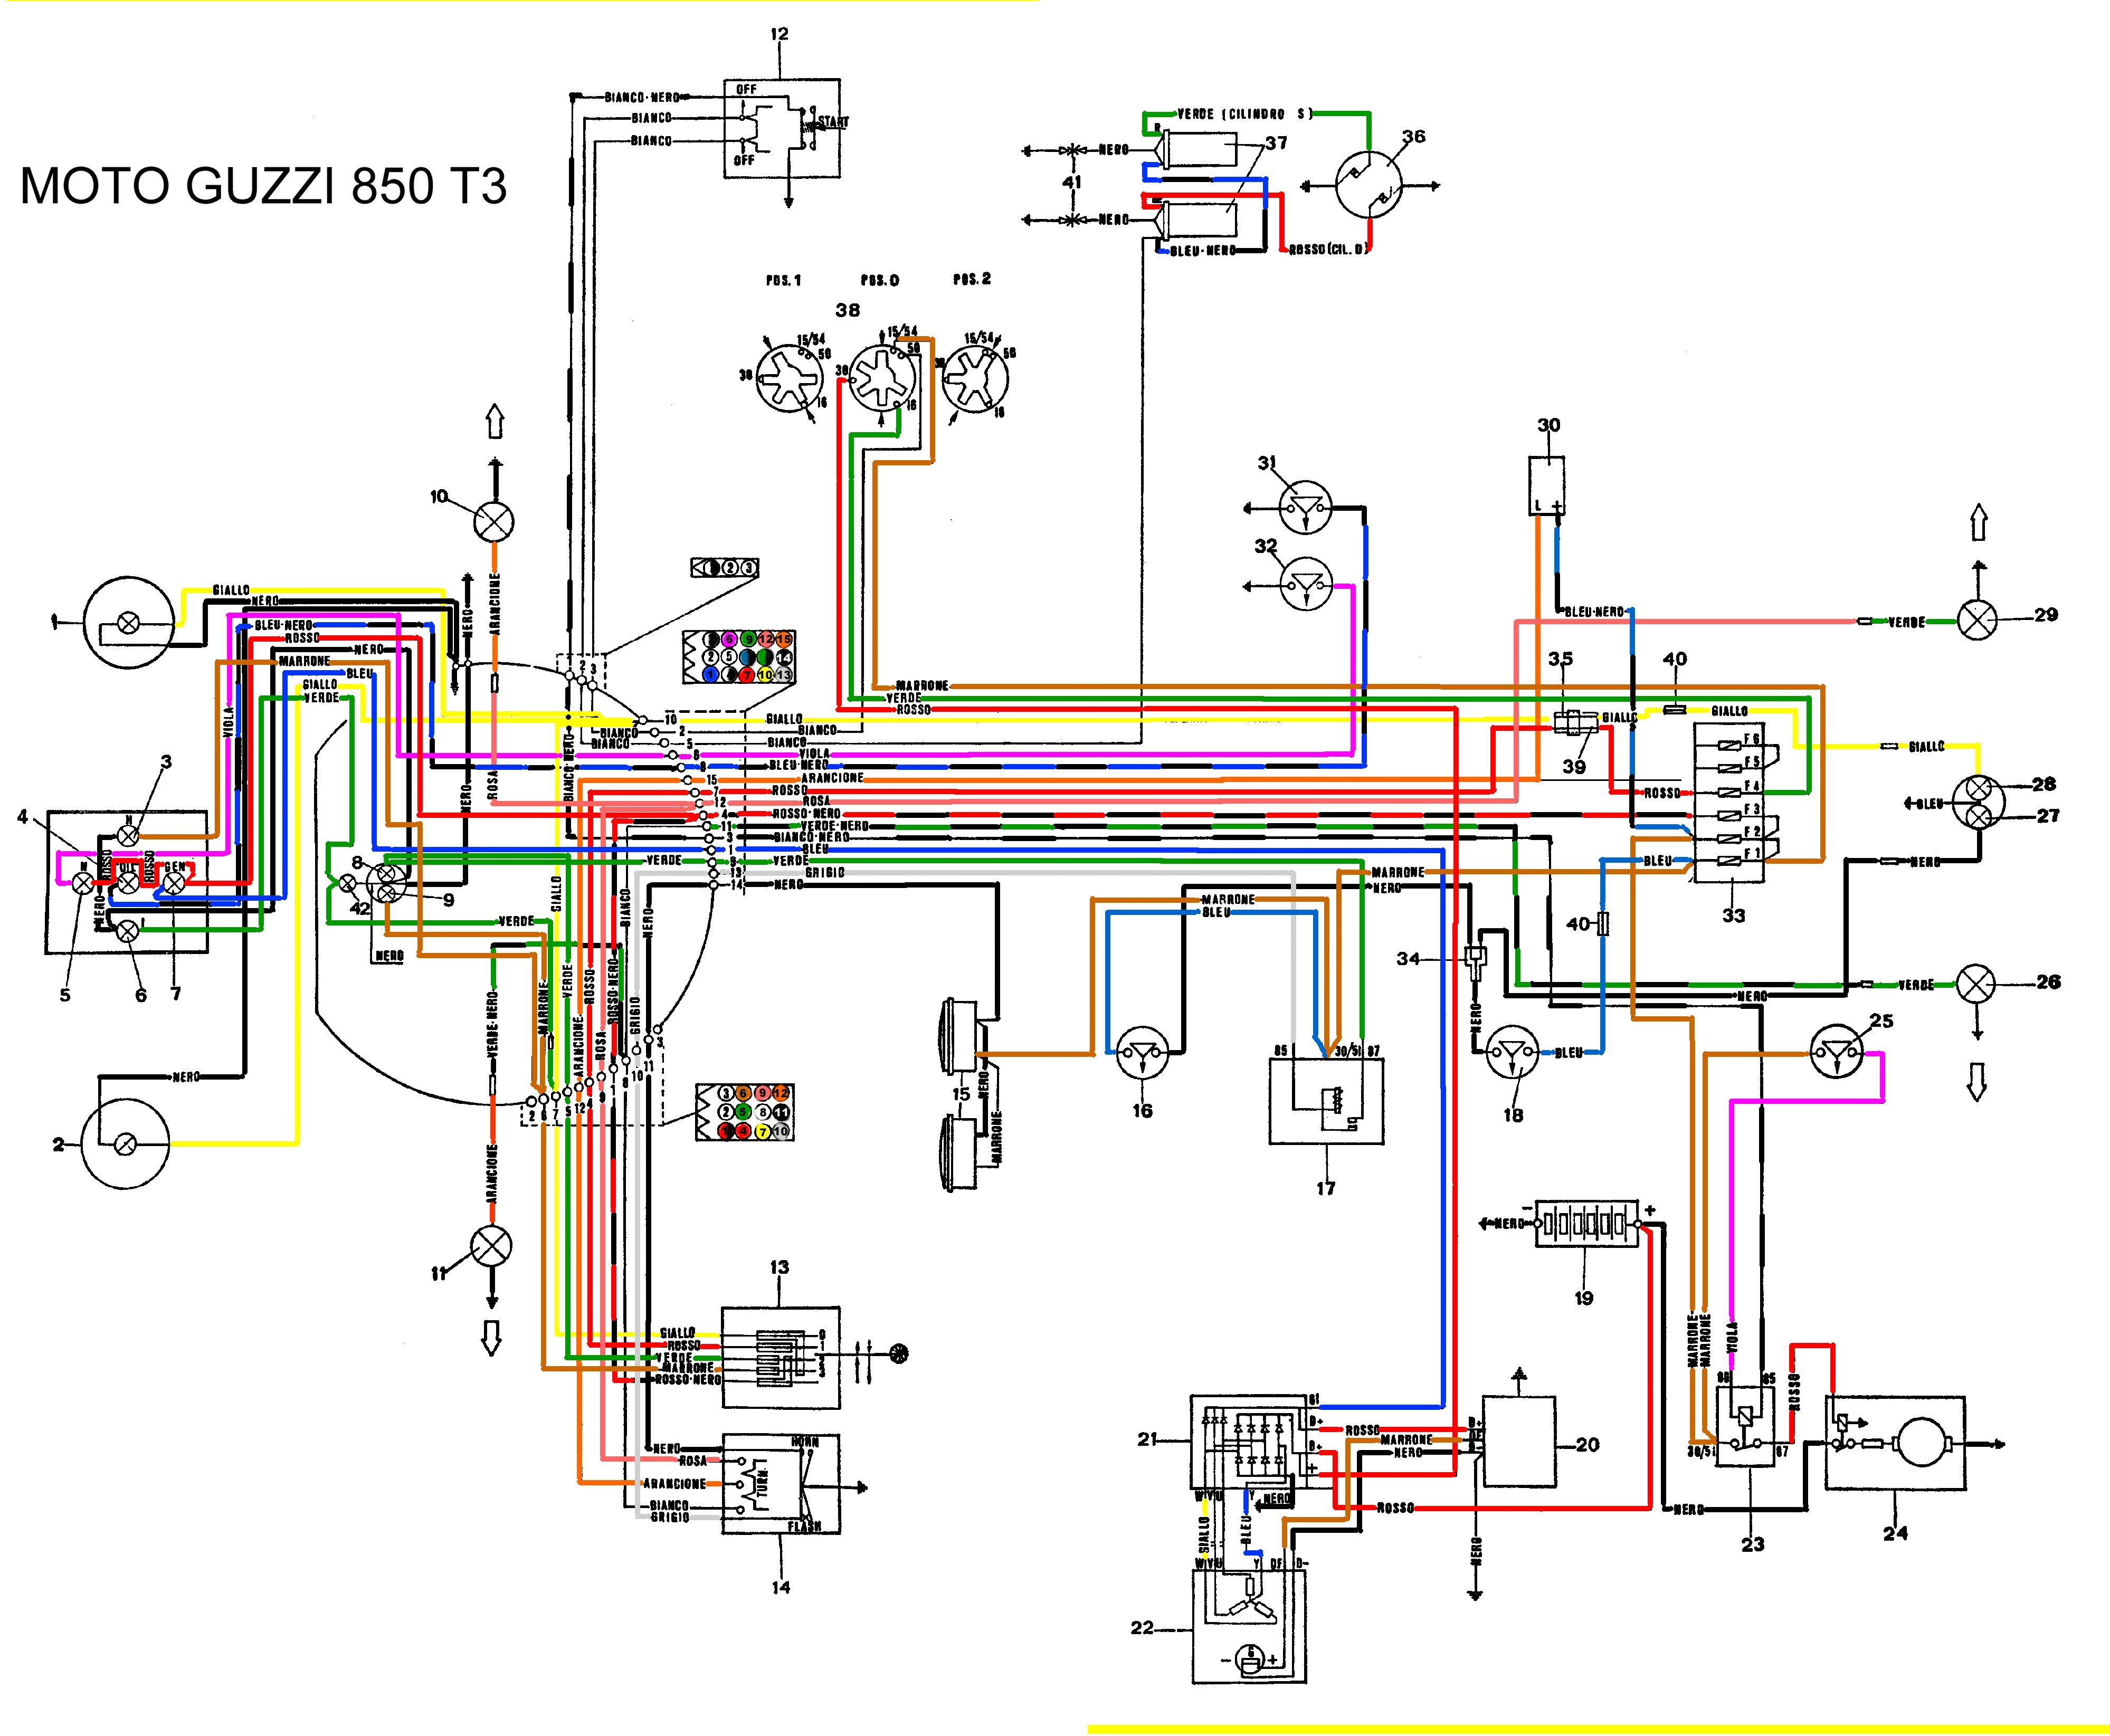 Schema Elettrico City : Index of schemas electriques gb